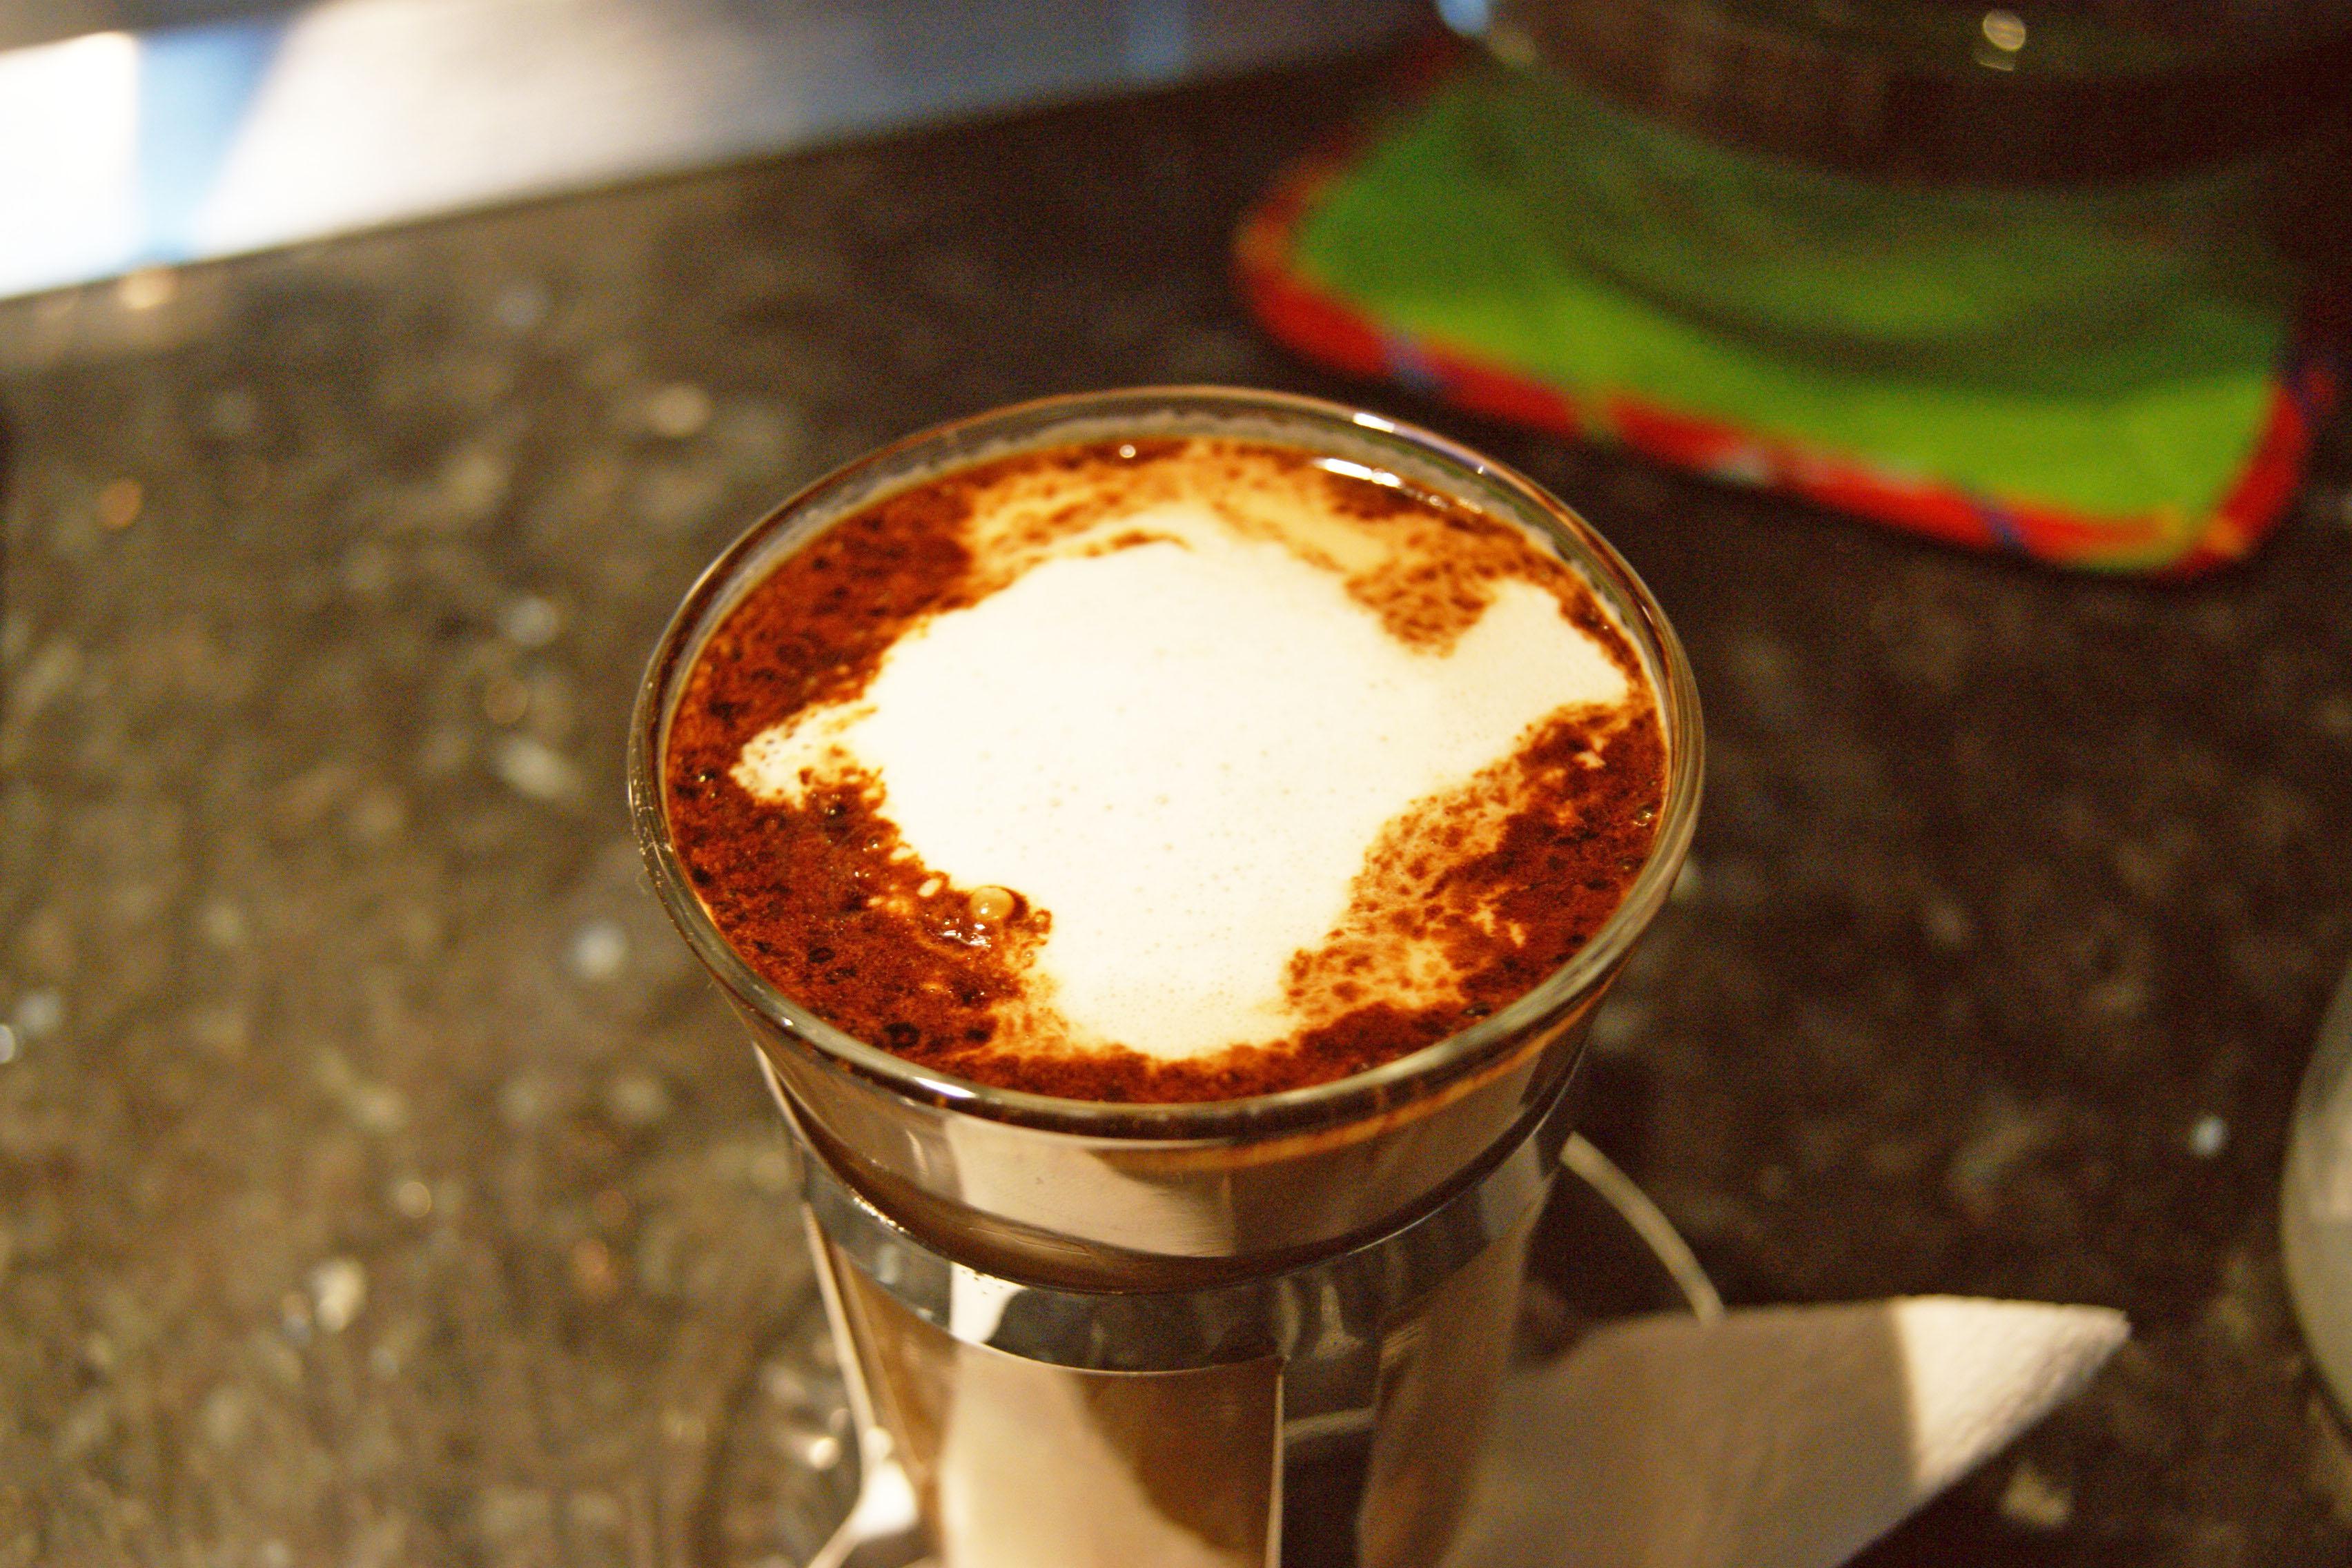 How to Make a Caramel Macchiato 12 Steps  wikiHow